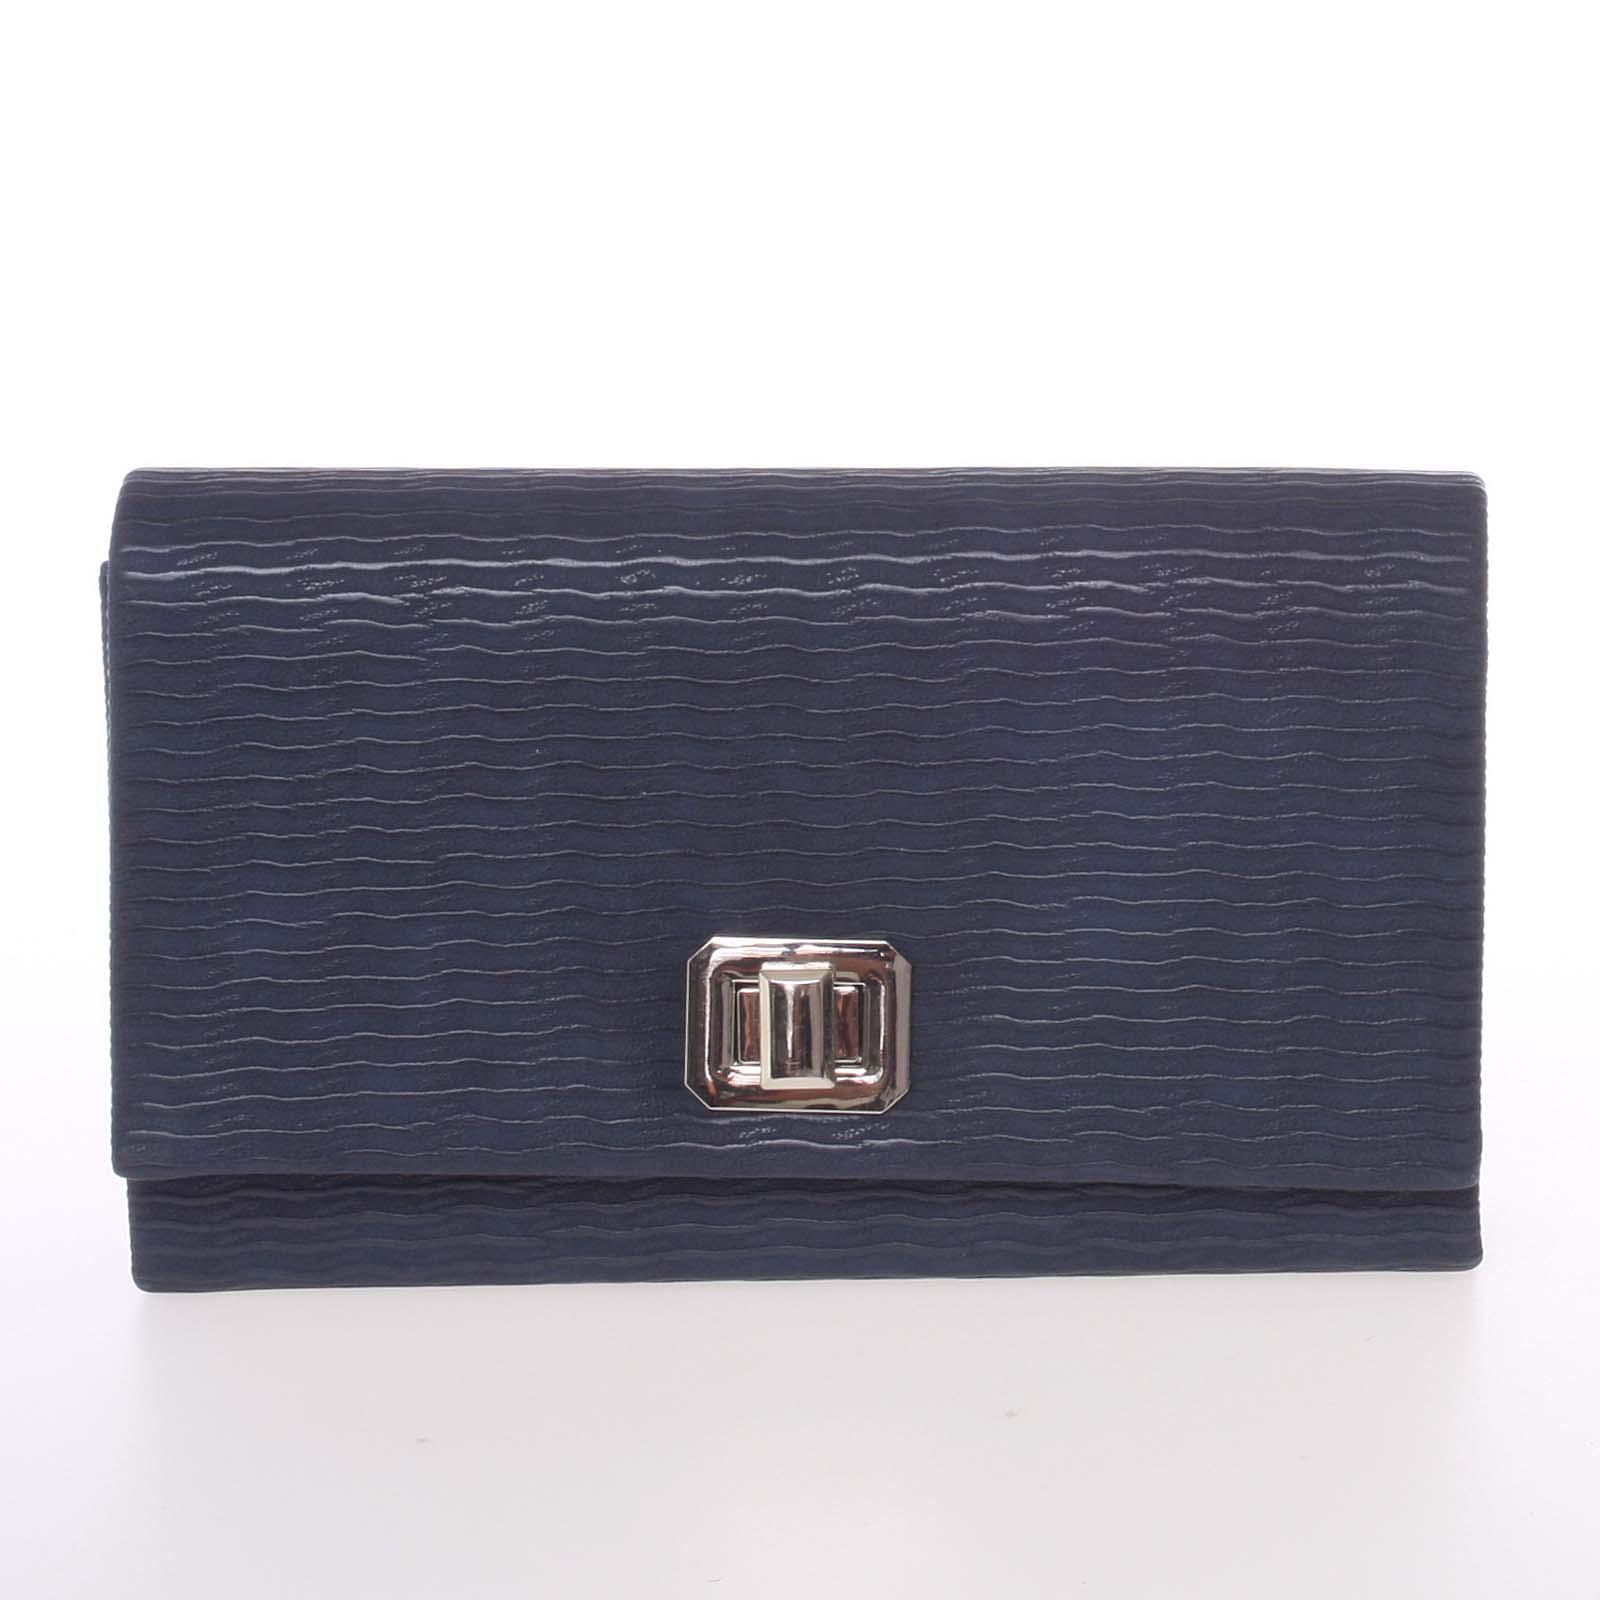 Módna dámska vzorovaná listová kabelka tmavomodrá - Delami D694